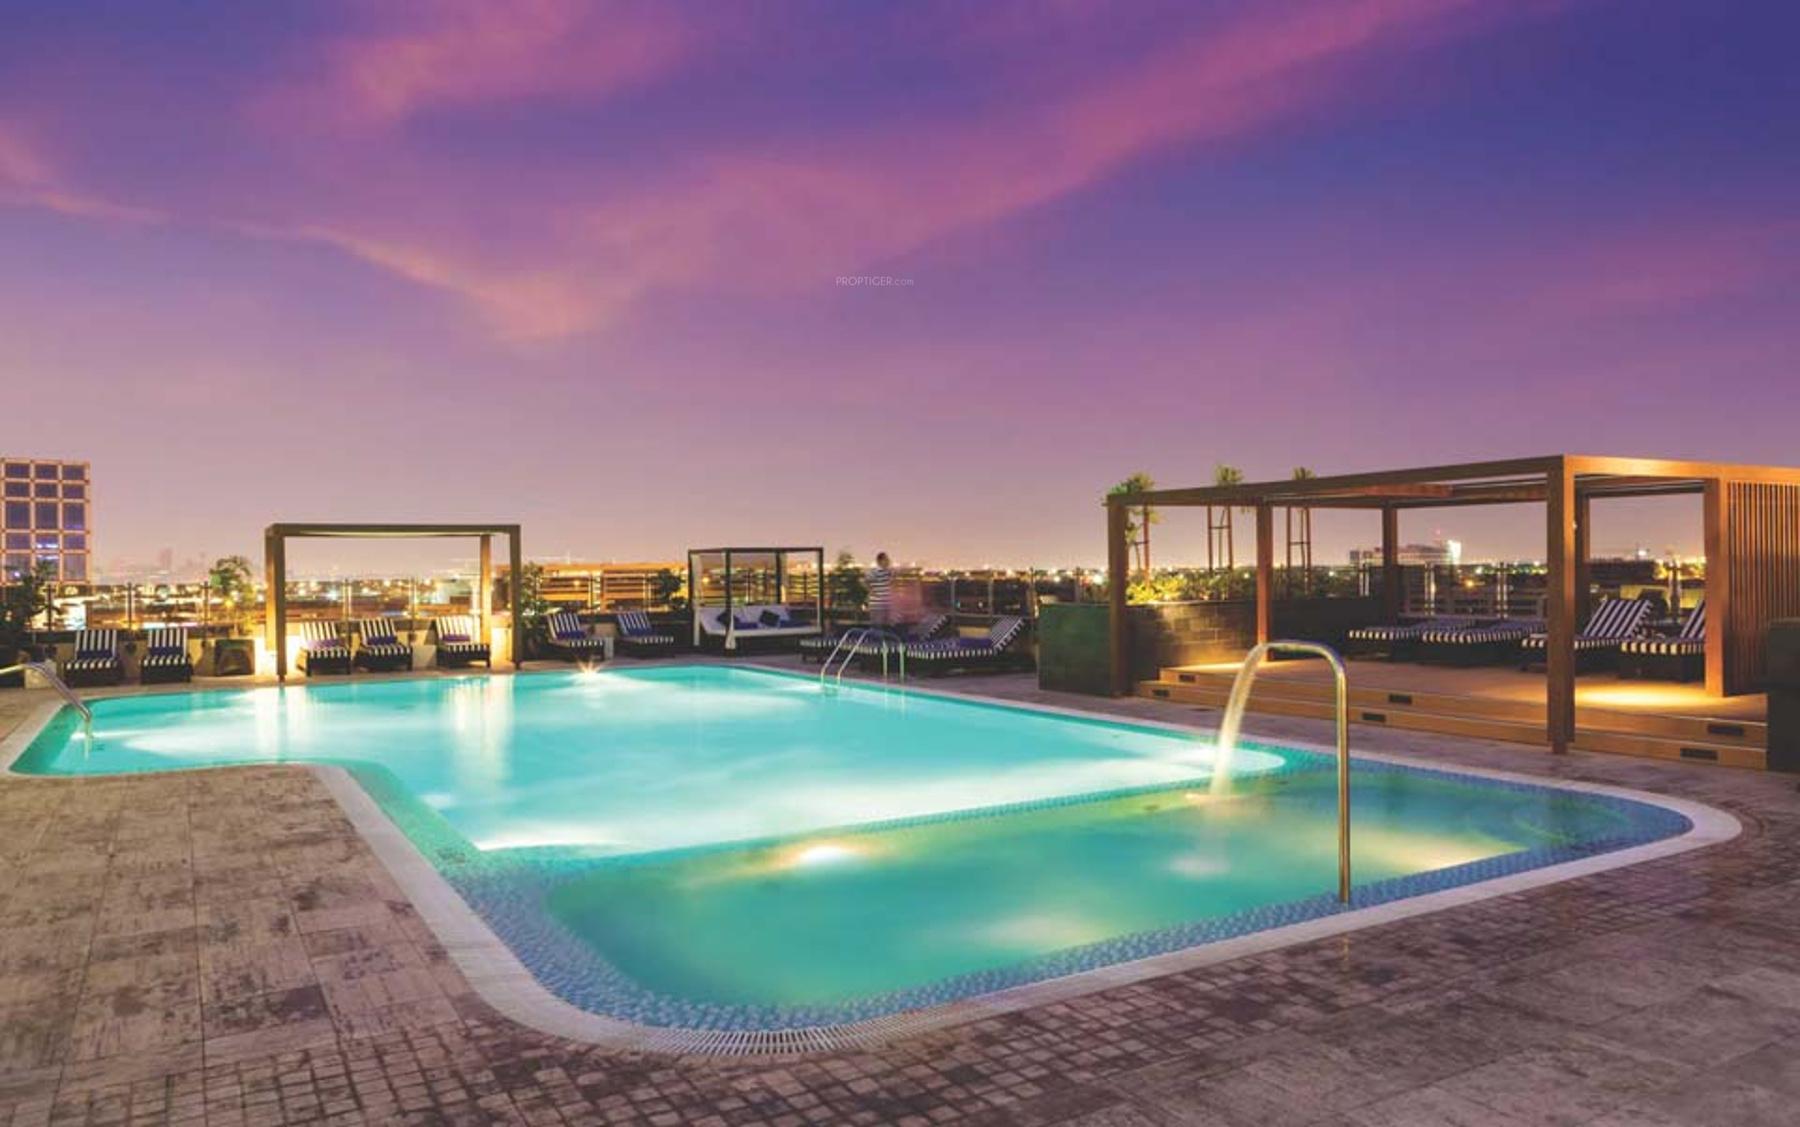 3470 Sq Ft 3 Bhk 4t Apartment For Sale In Dream India Valencia Banjara Hills Hyderabad